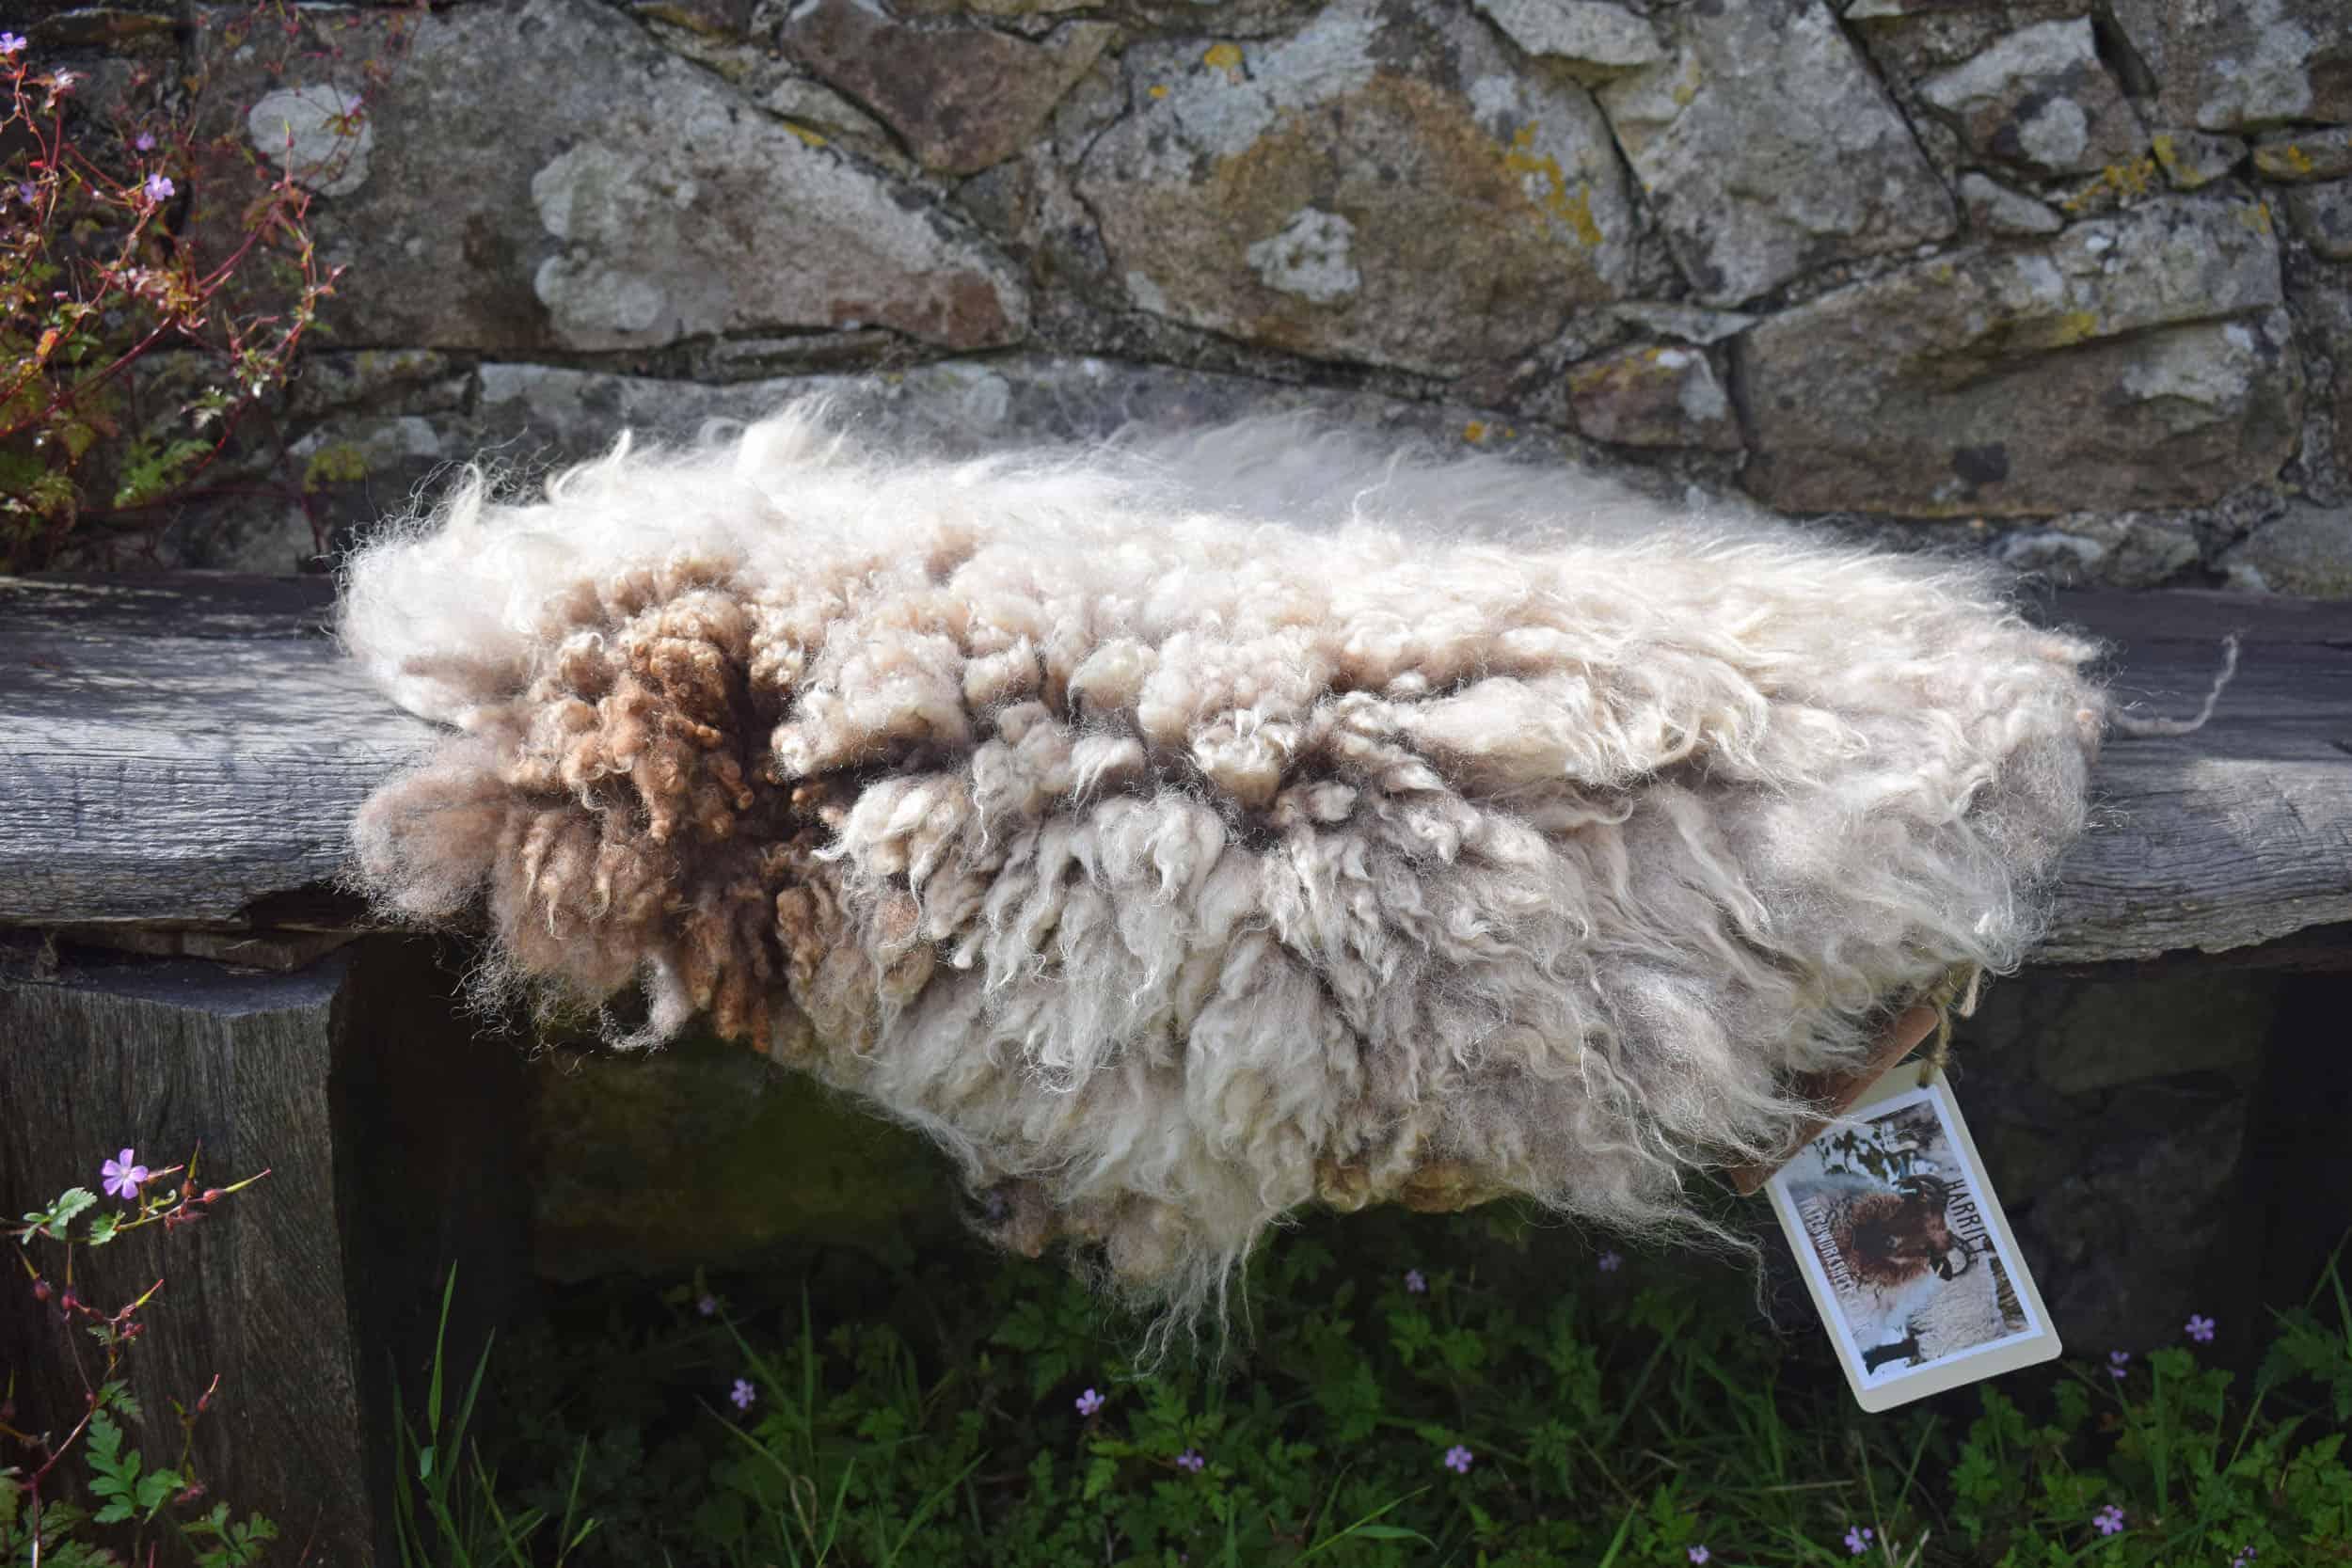 Felted fleece vegetarian sheepskin wool seat pad brown harriet ethical kind fiber 3